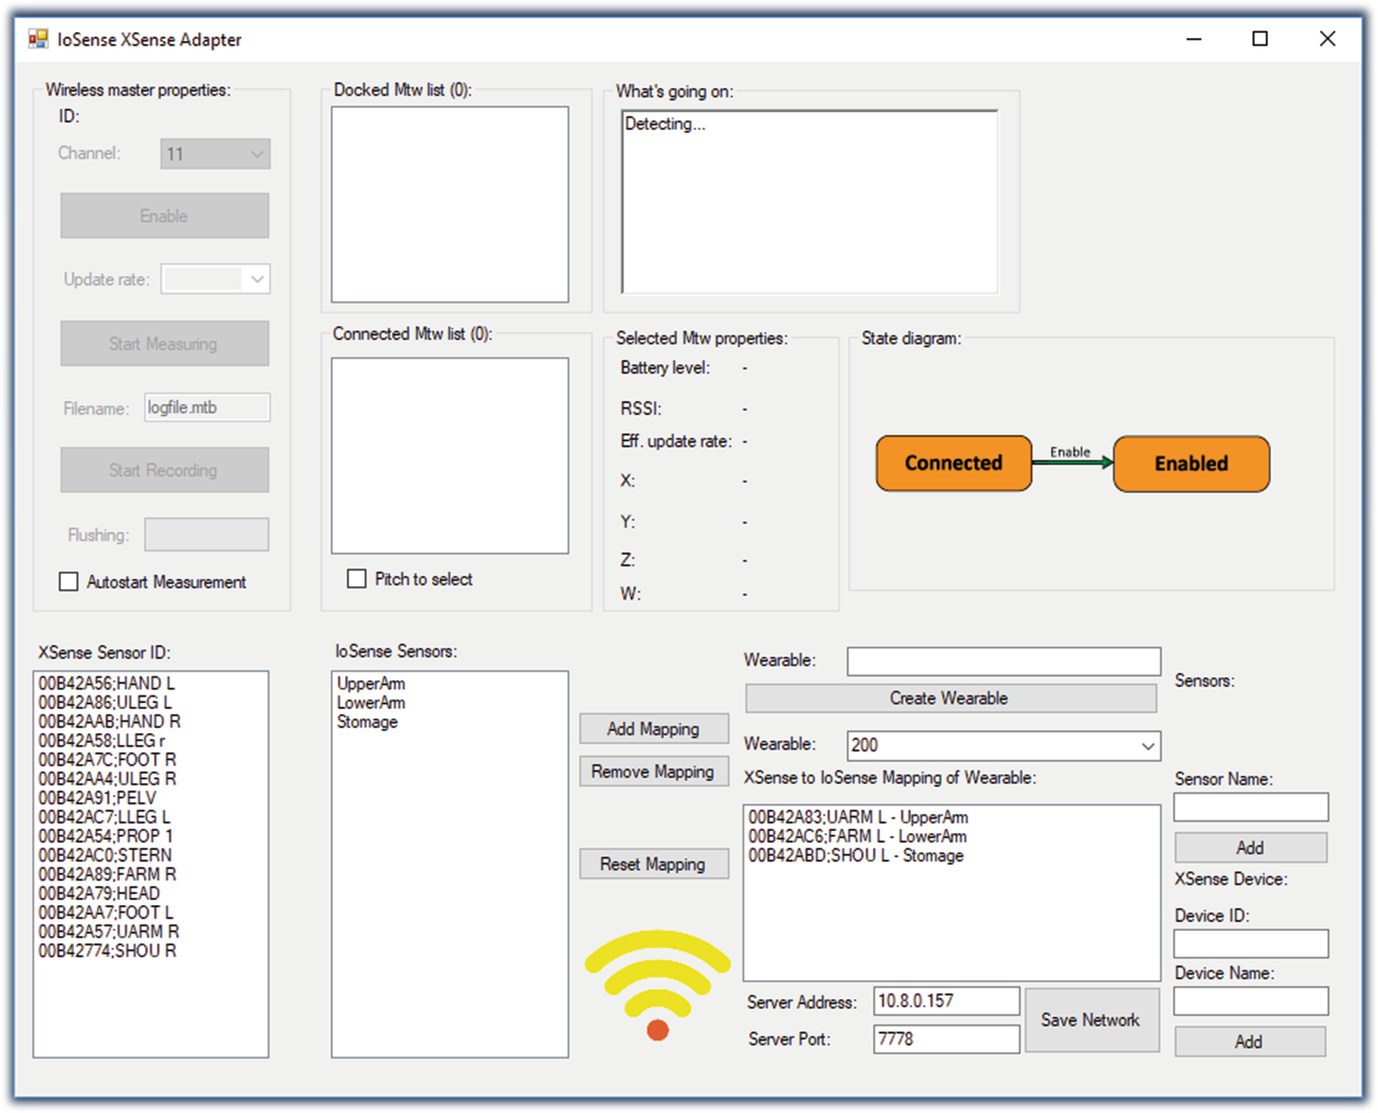 SPEED INTERNET TÉLÉCHARGER POUR WINDOWS BOOSTER 5.0.0 ROBUST